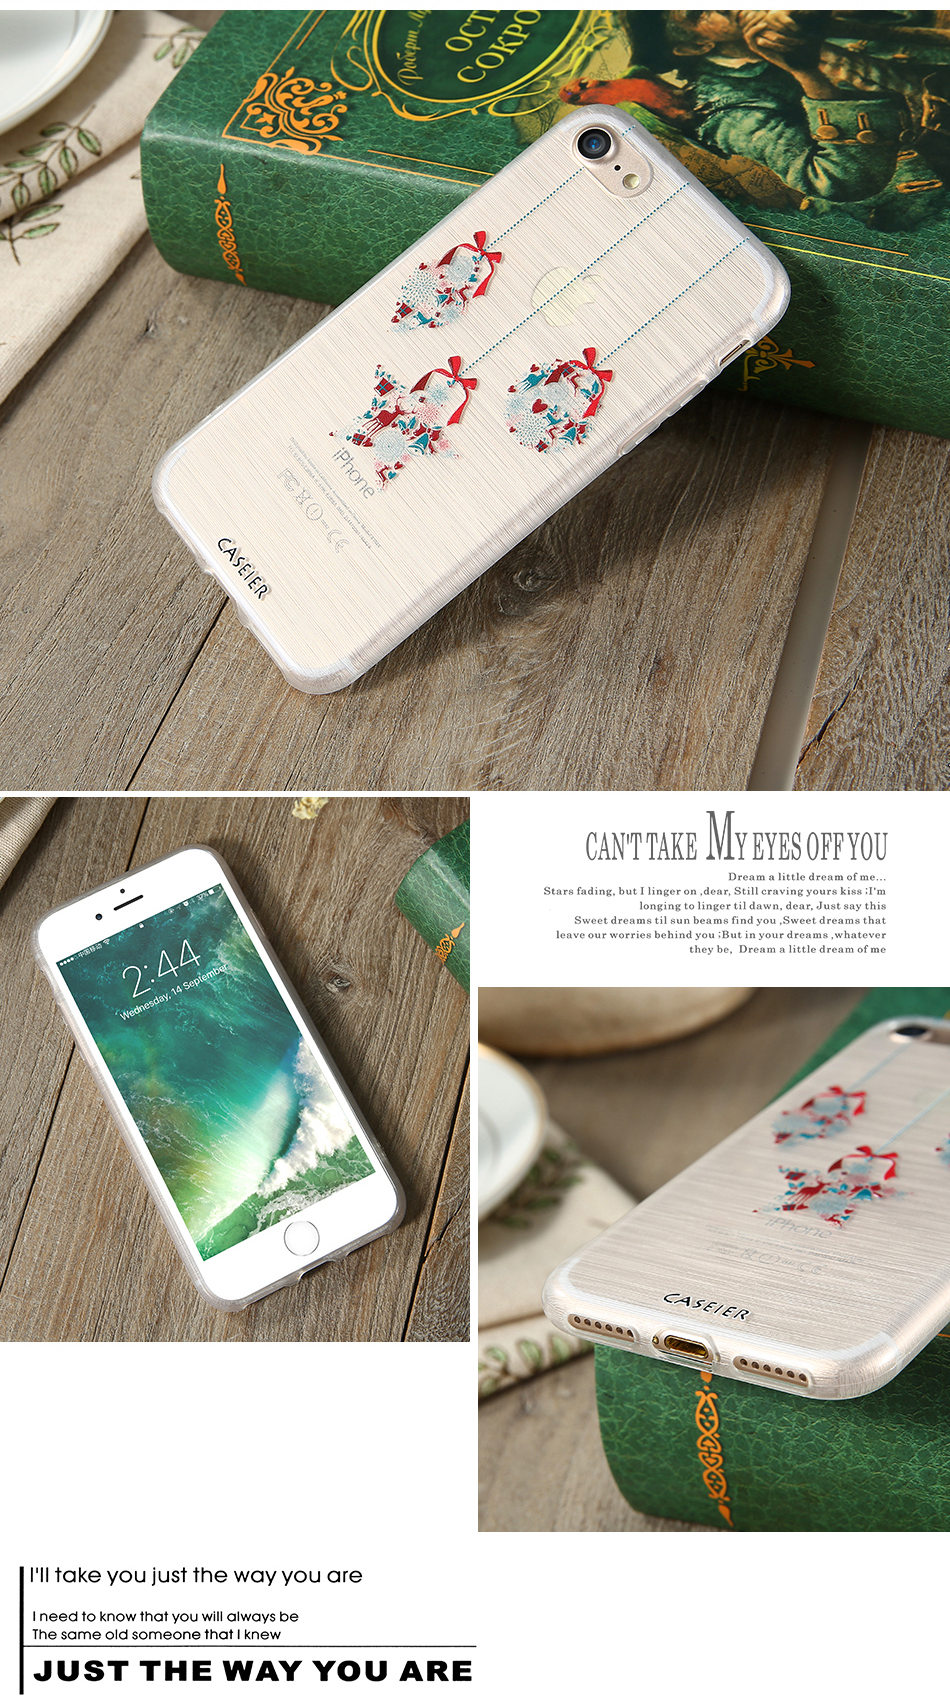 HTB1sp6SOpXXXXXMapXXq6xXFXXXg - Christmas Phone Case For iPhone 7 6 6S Plus iPhone 5S SE 5 Cases For Samsung Galaxy S6 S7 Edge Cute Cover Accessories PTC 286